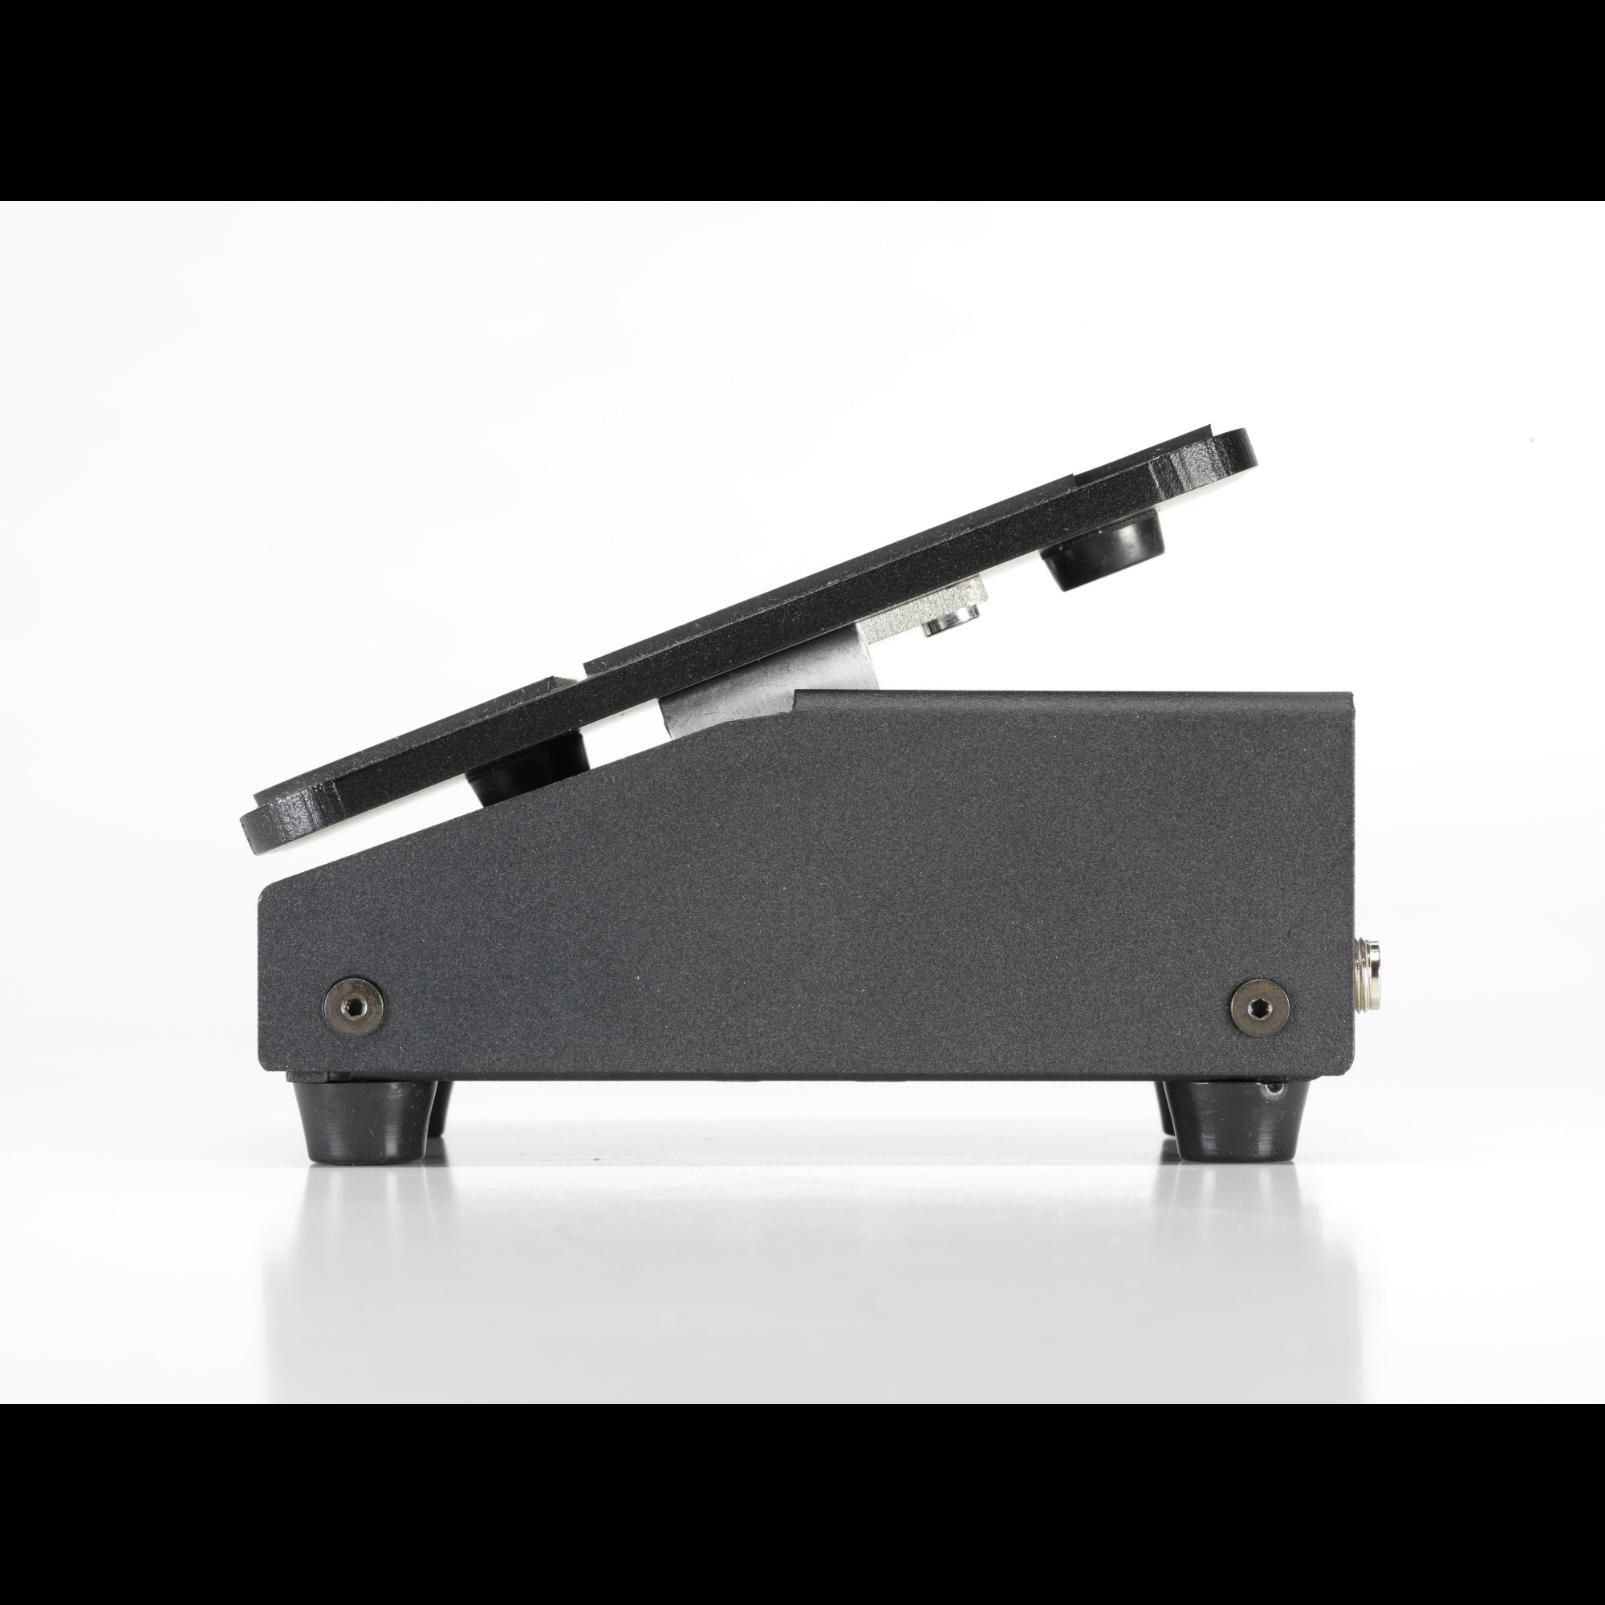 DOD Mini Expression - Black - Expression Pedal - Left